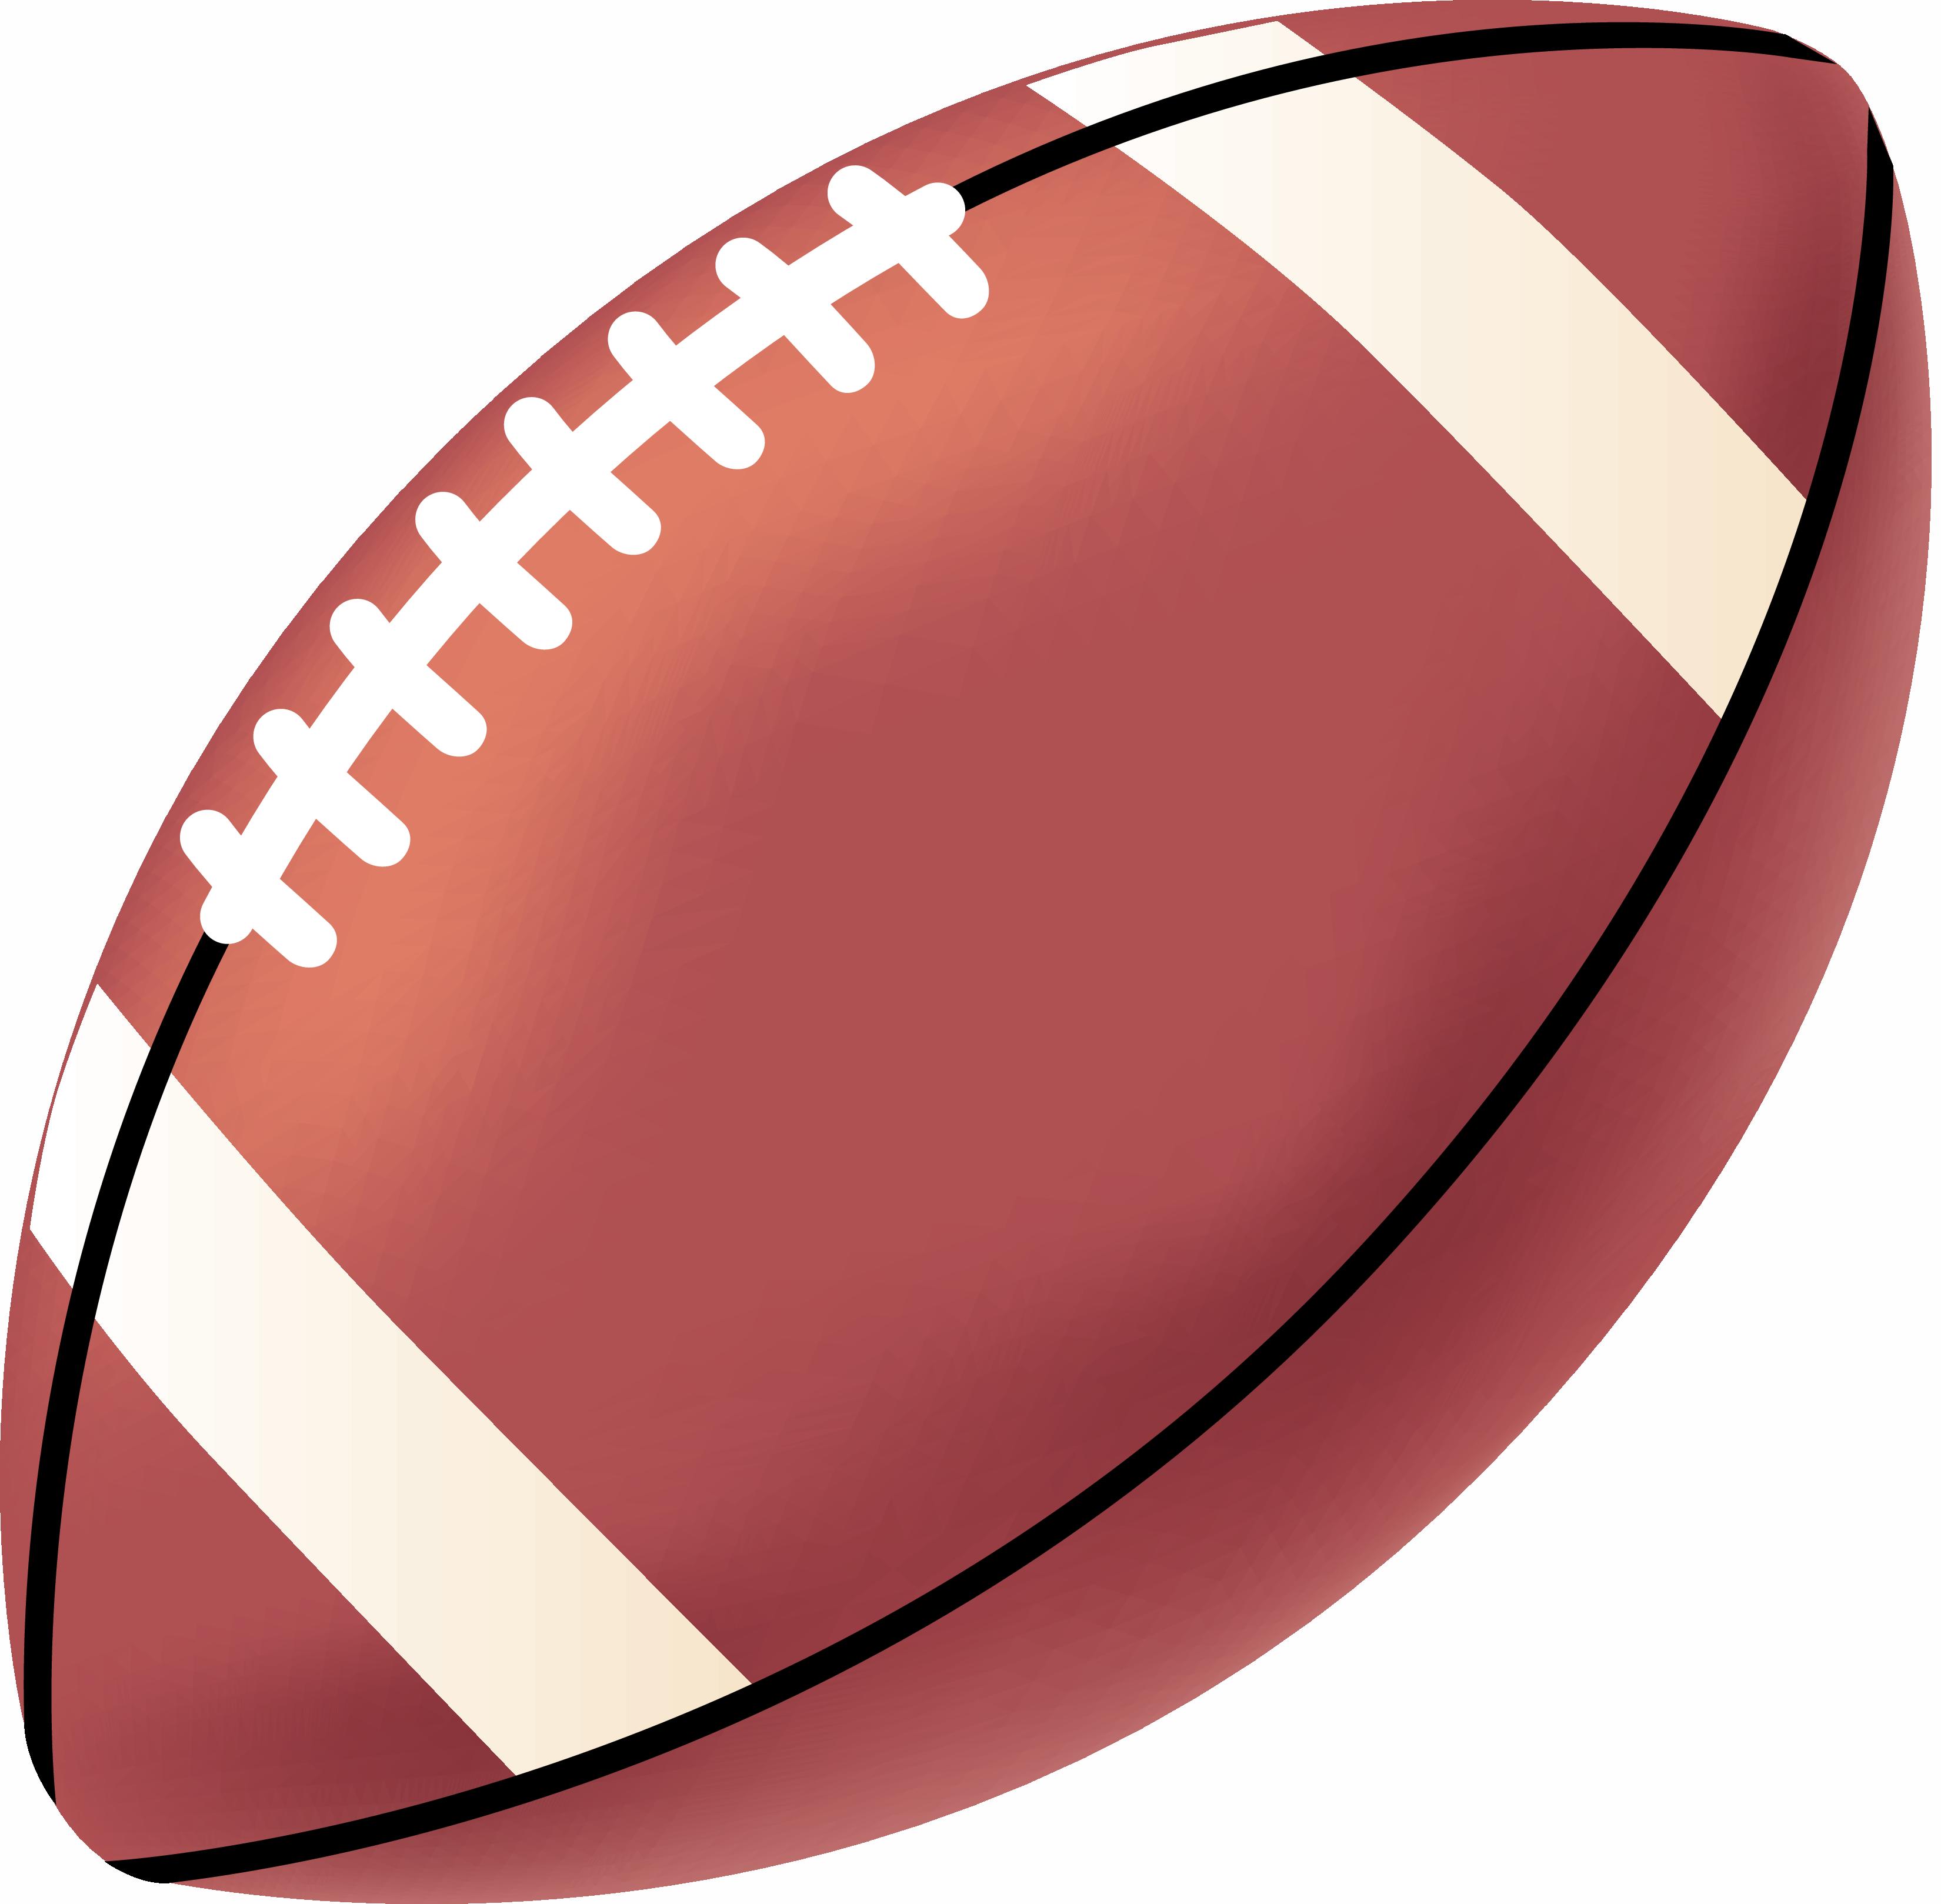 Football clipart printable Football clipart art Clipartix Football